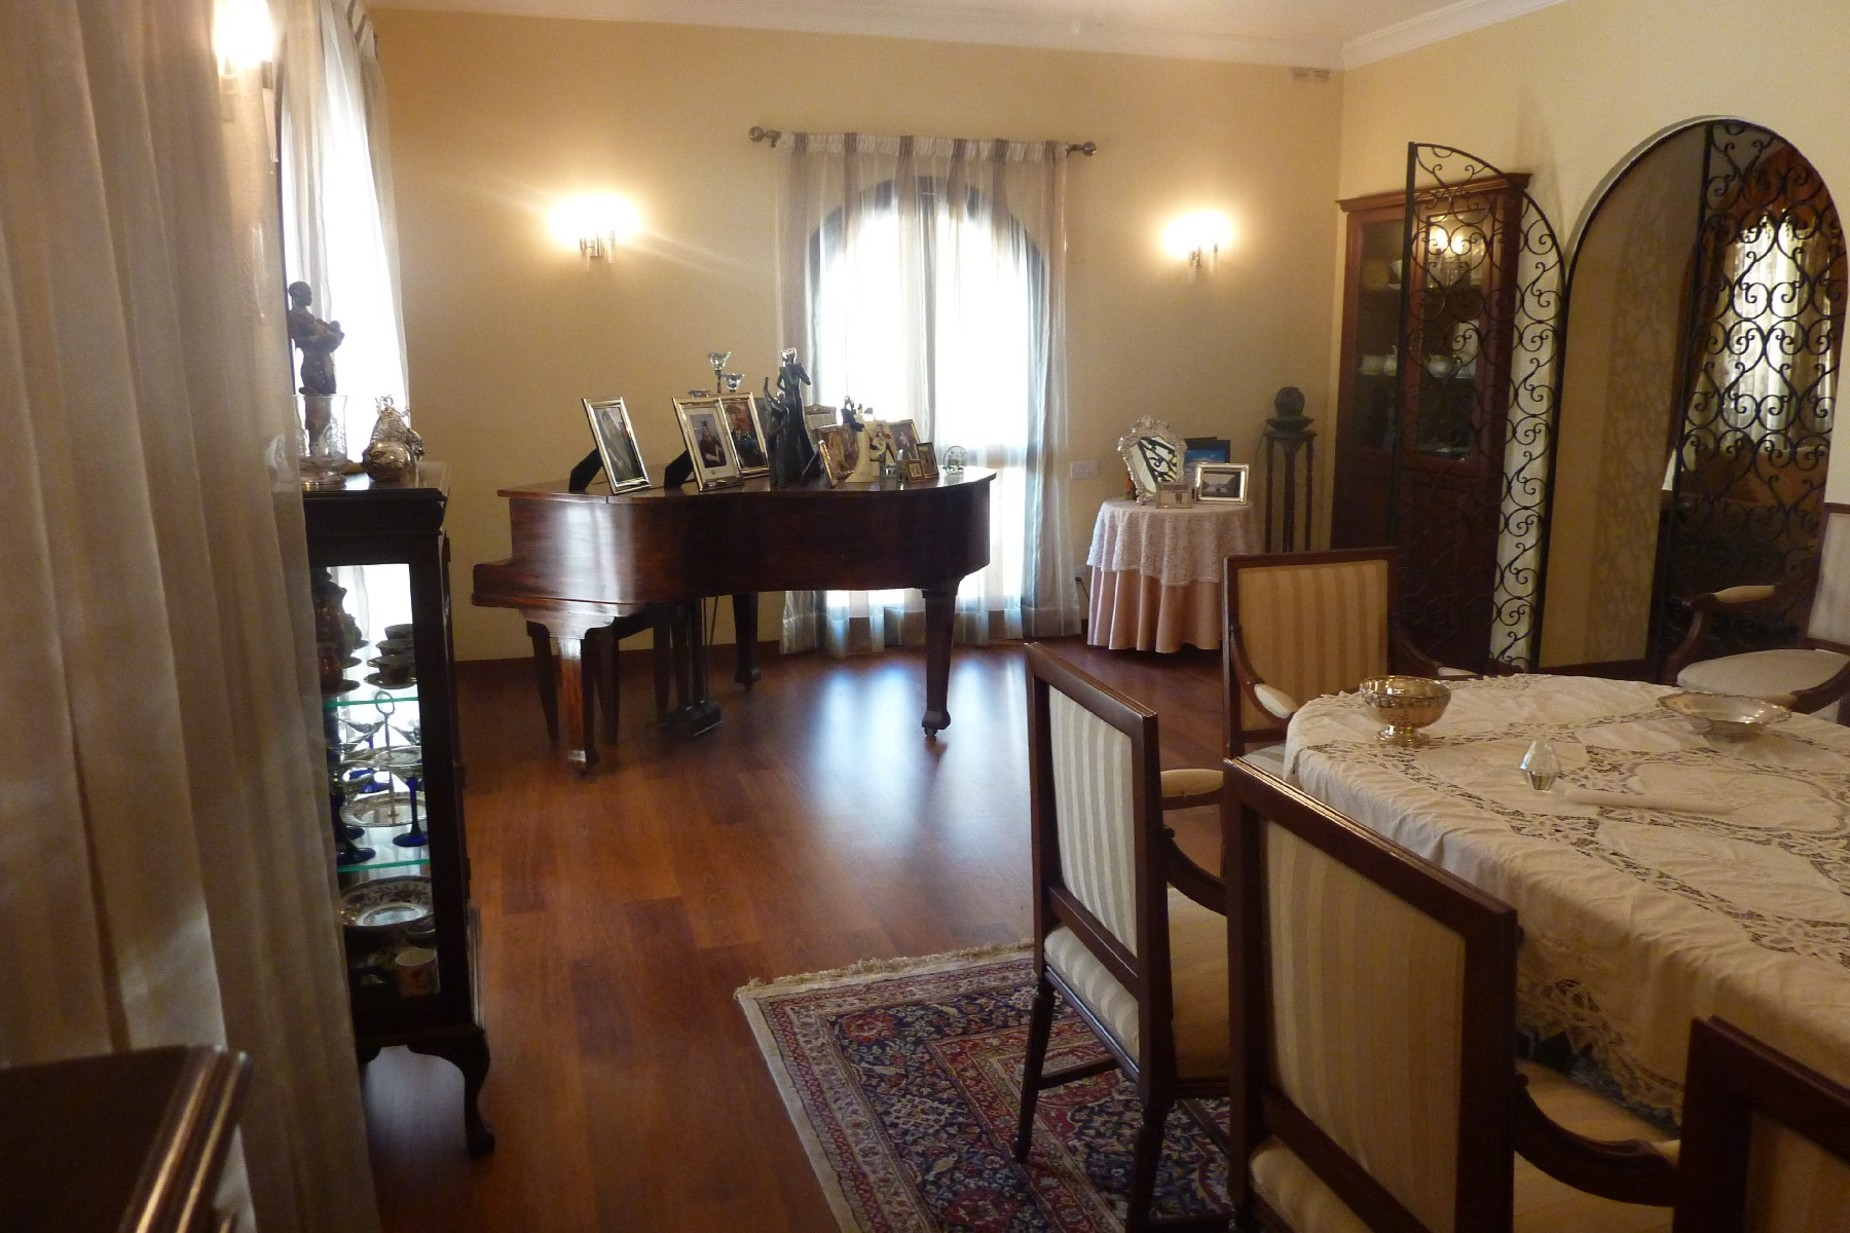 4 bed Villa For Sale in Gzira, Gzira - thumb 4